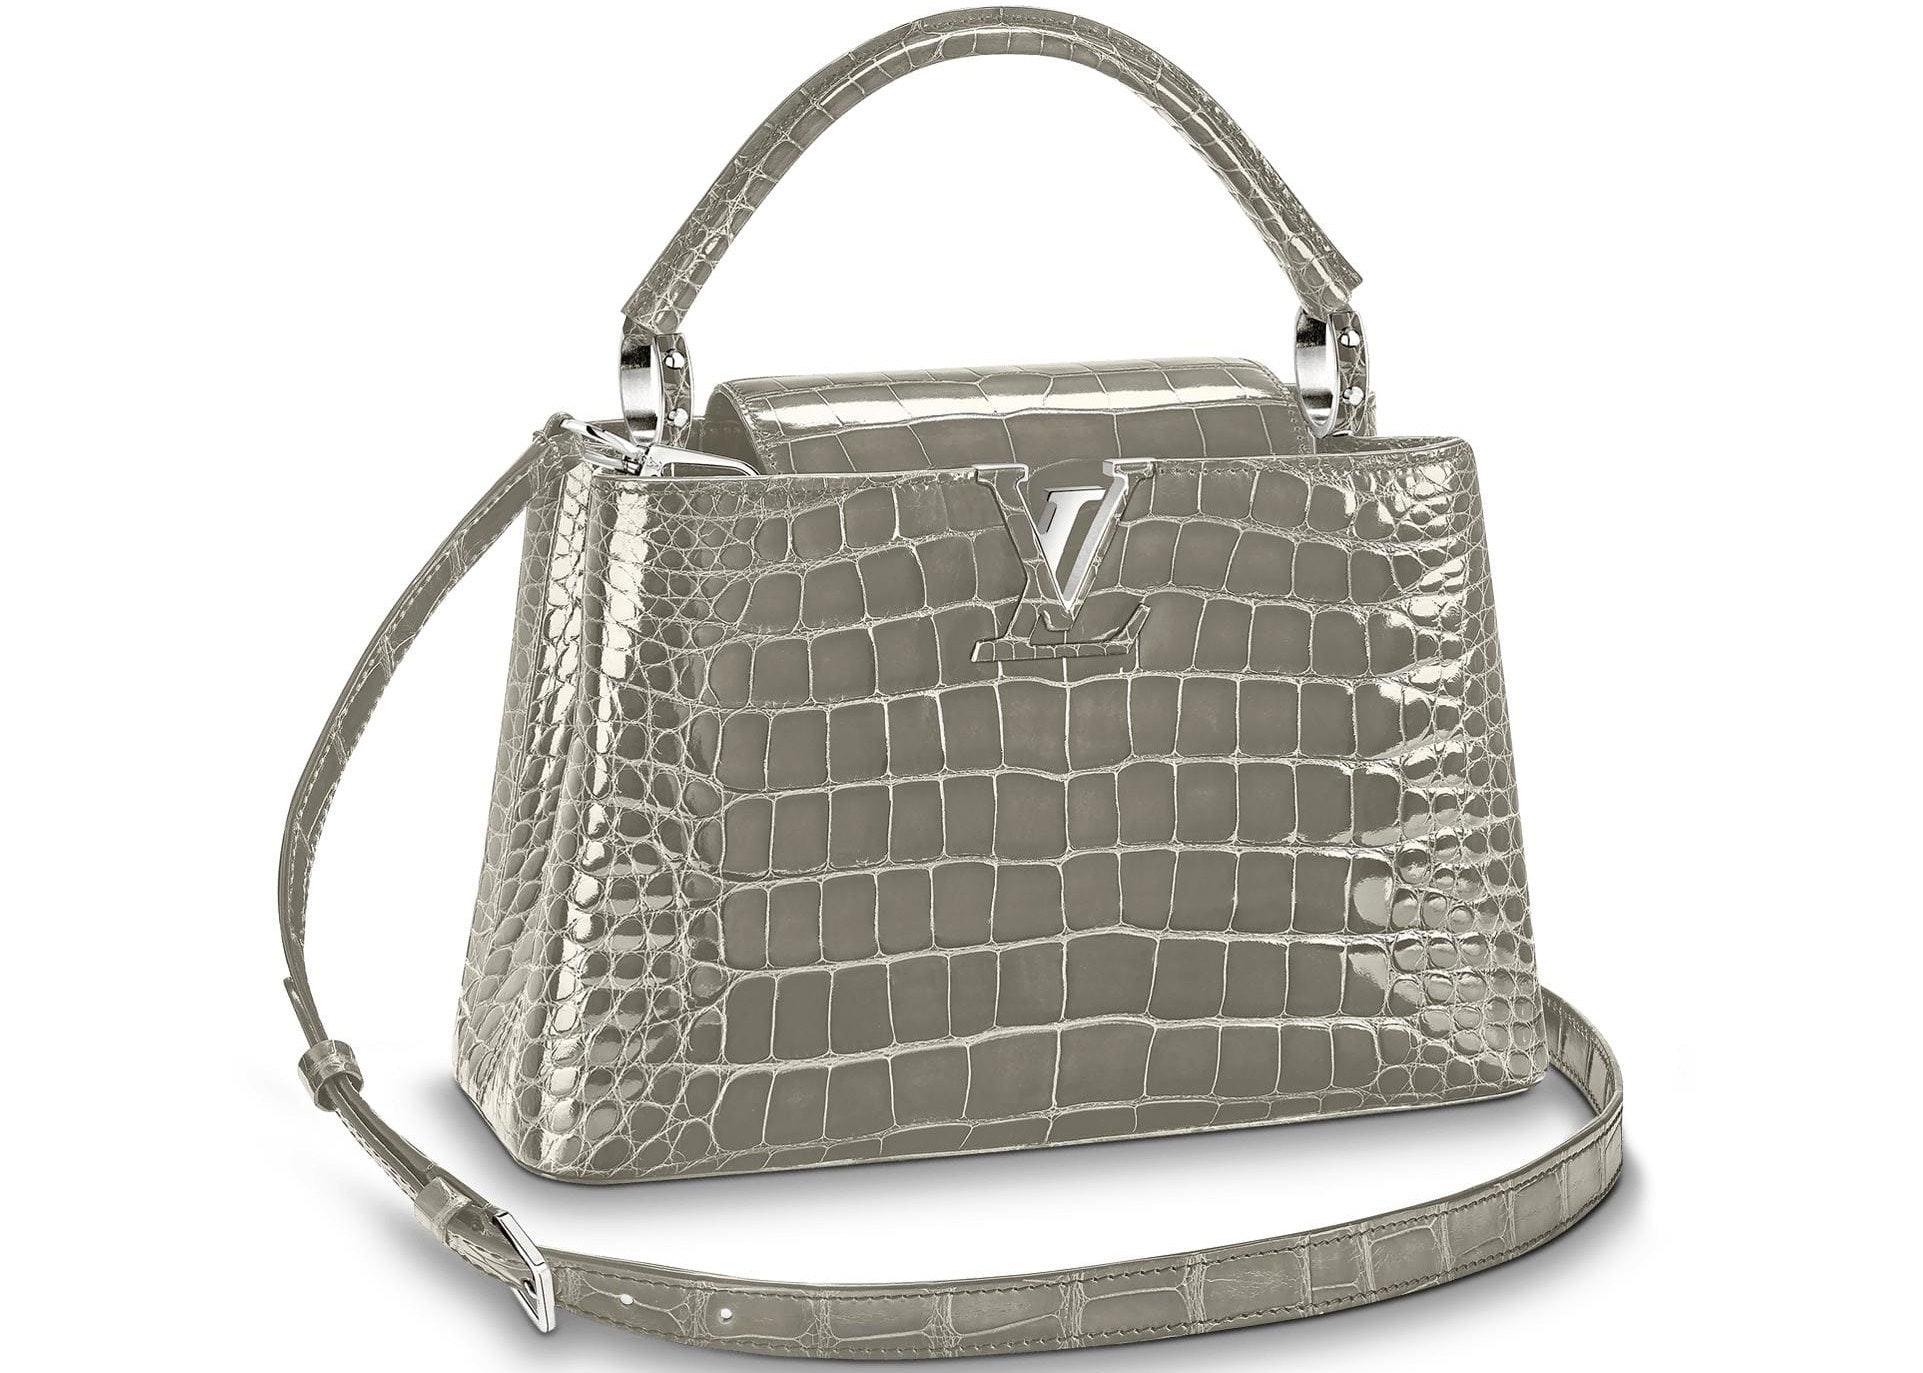 Louis Vuitton Capucines Crocodile Brillant Silver-tone PM Gris Perle